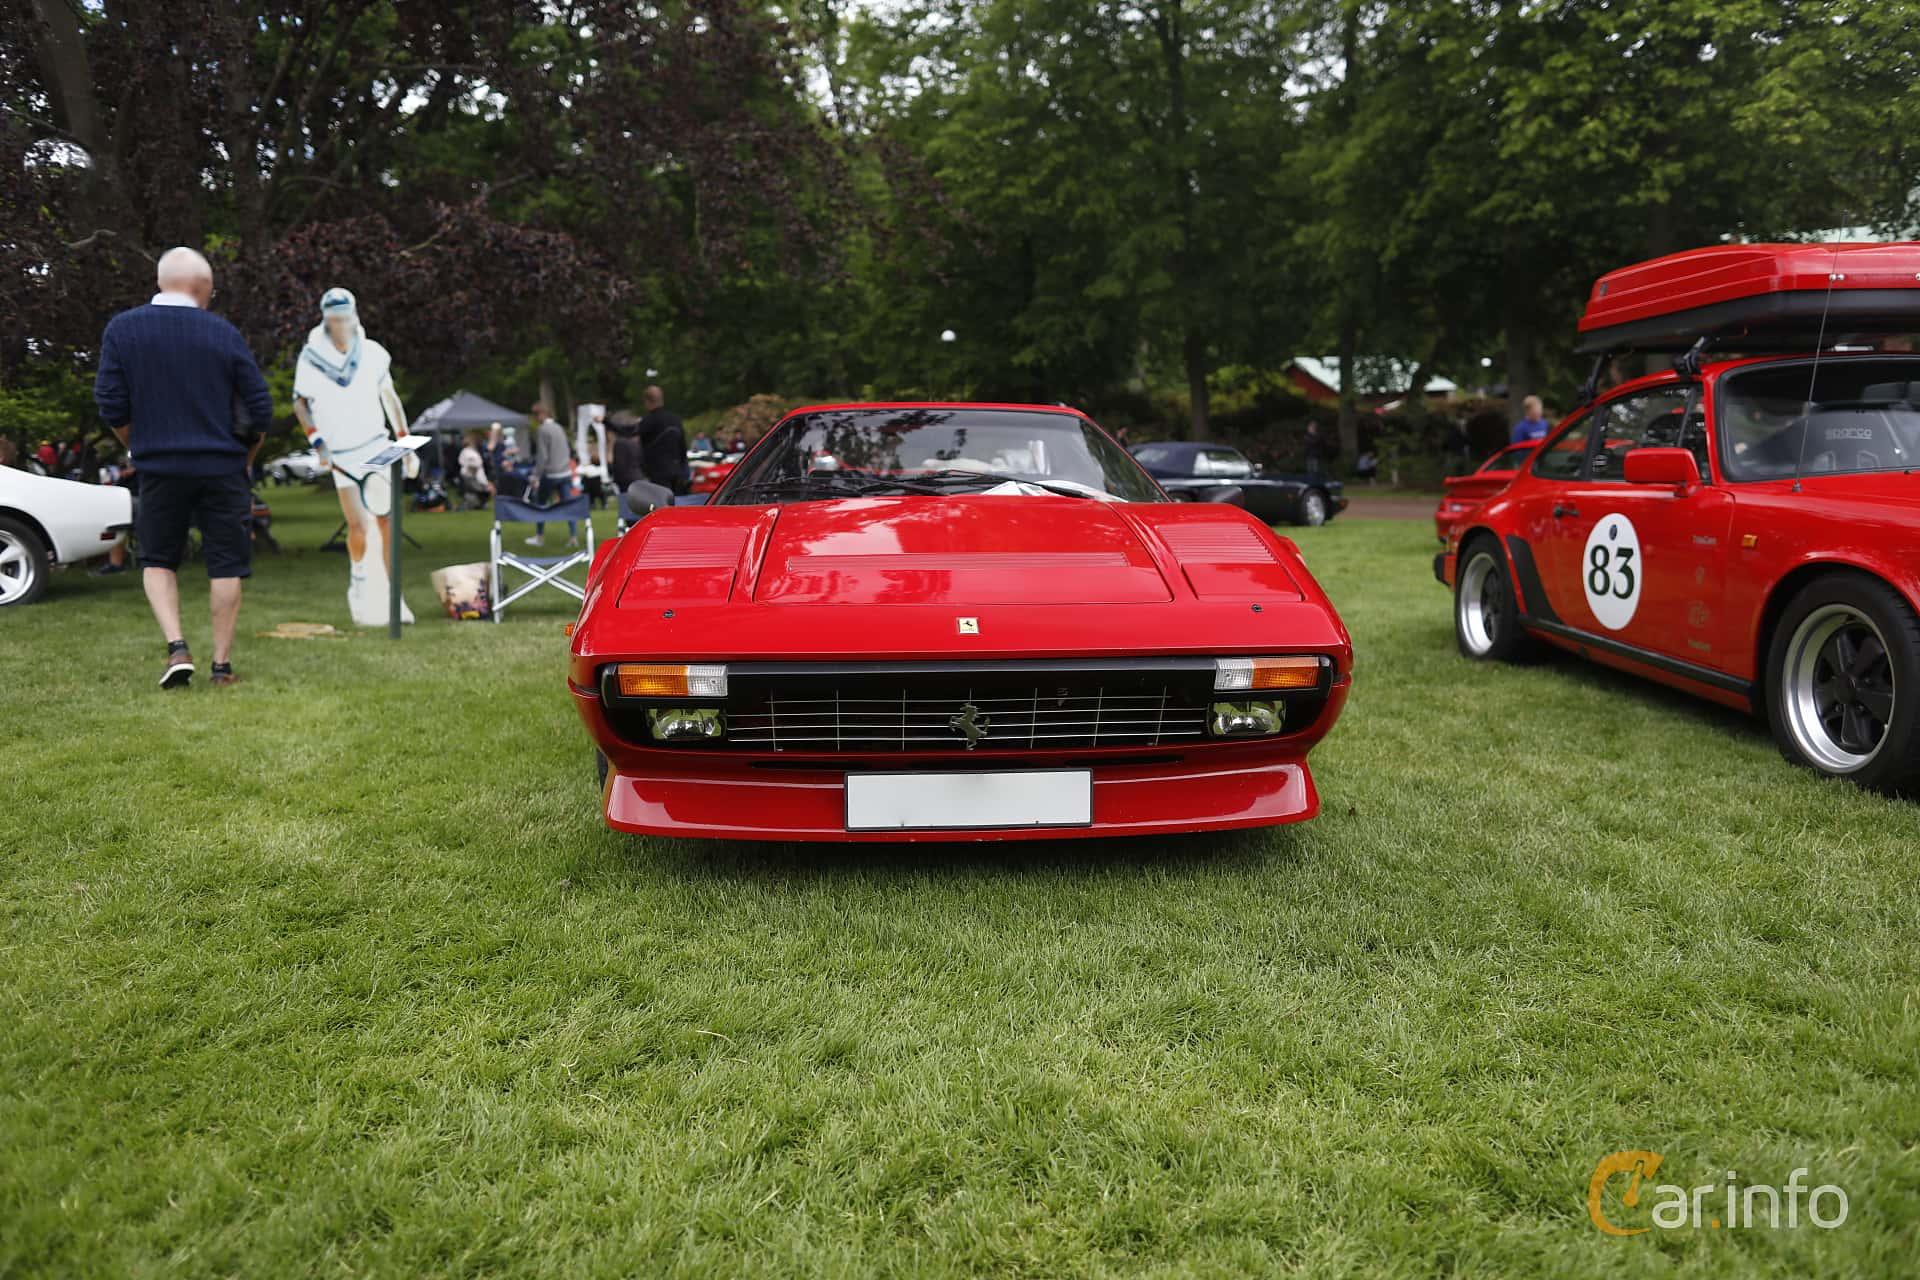 Ferrari 308 GTSi Quattrovalvole 2.9 V8 Manual, 240hp, 1985 at Sofiero Classic 2019